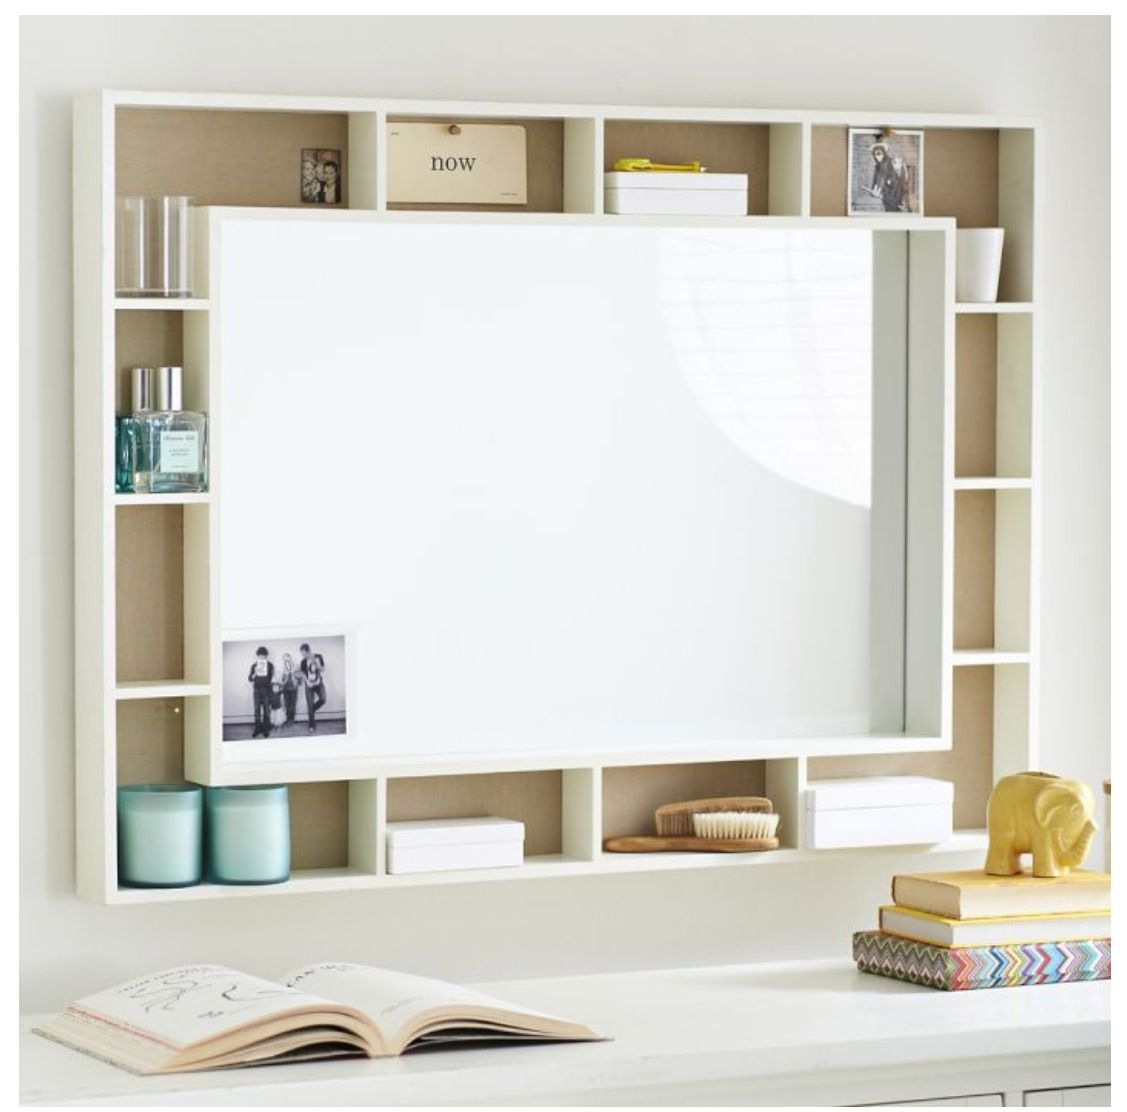 Shelving Around A Whiteboard Corkboard Mirror Nice